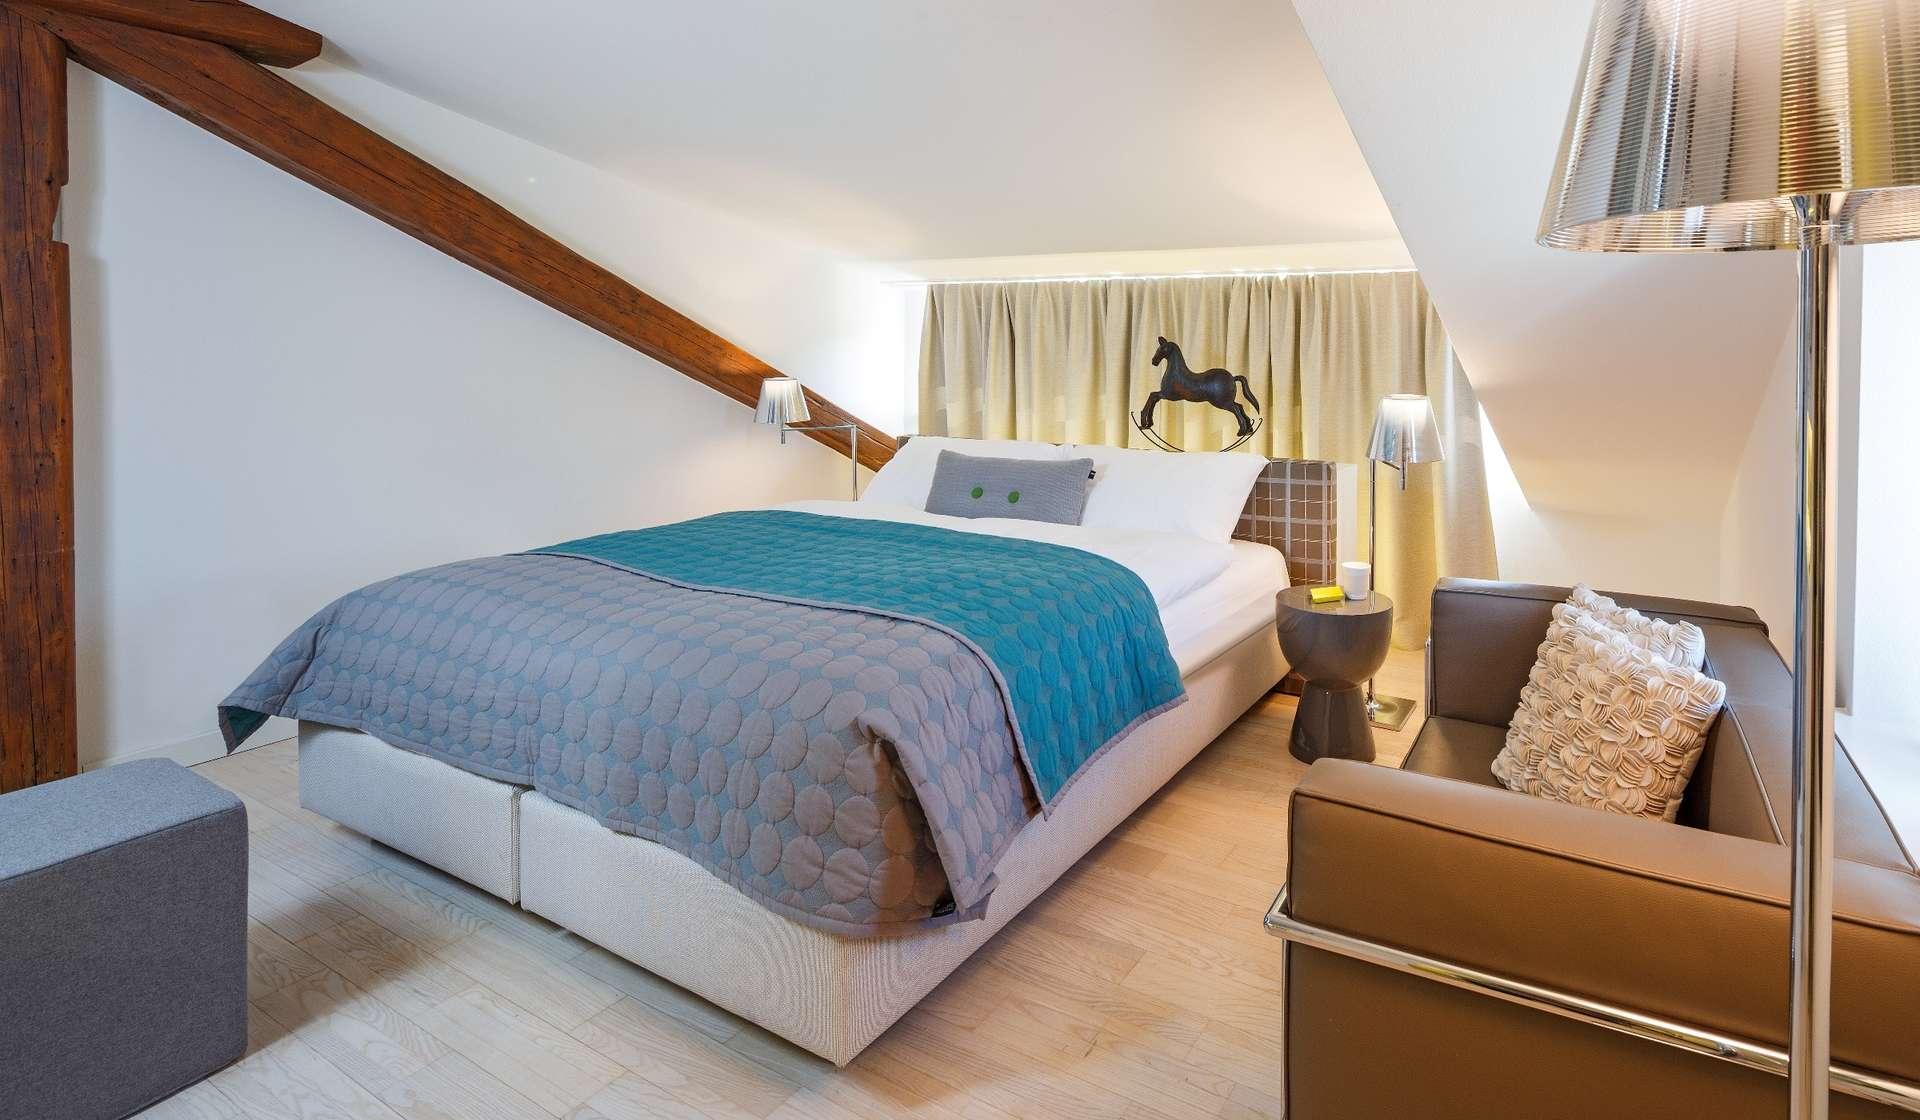 csm_Hotel_Roessli_Zuerich_Schweiz_JuniorSuite_Bett_boxspring_1ca04d7b60